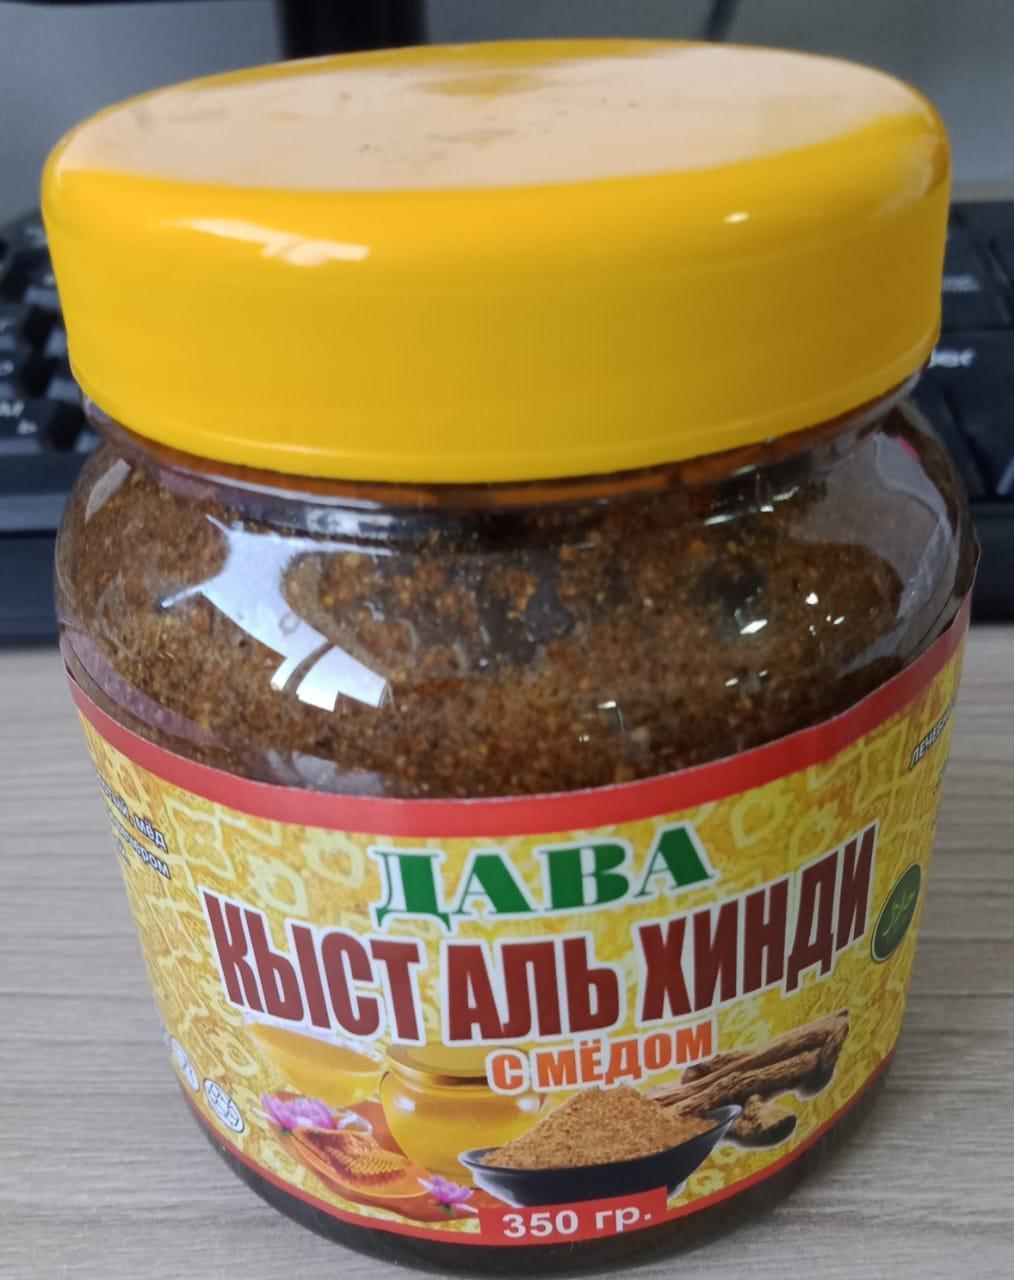 Кыст аль-хинди с медом, 350 г